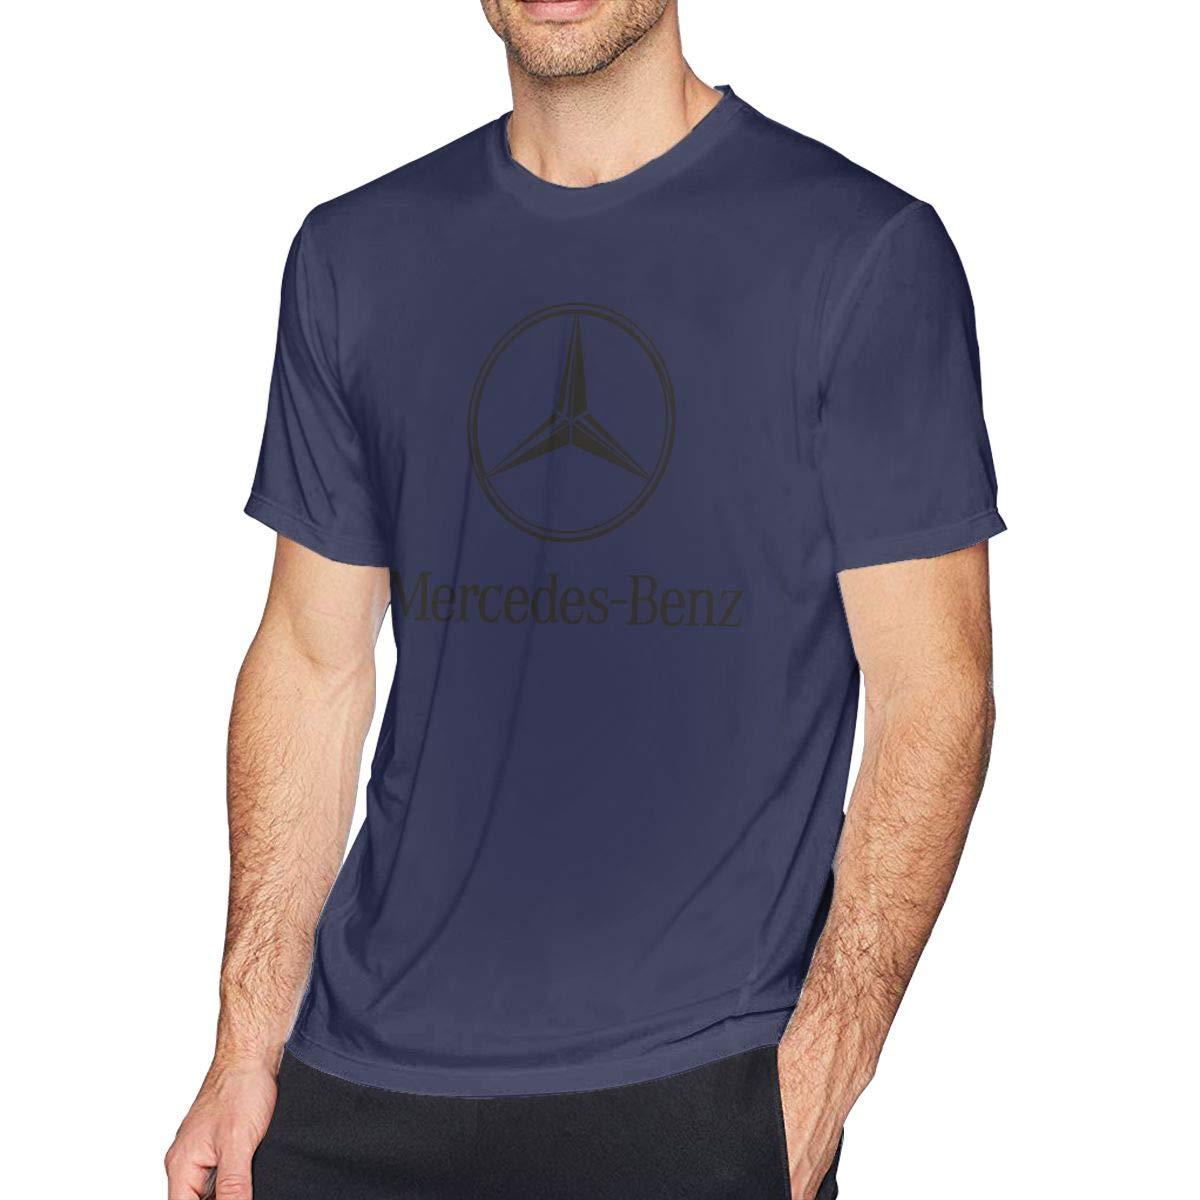 SHENGN Men Designed Mercedes Benz Logo O-Neck Funny Tshirts Deep Heather